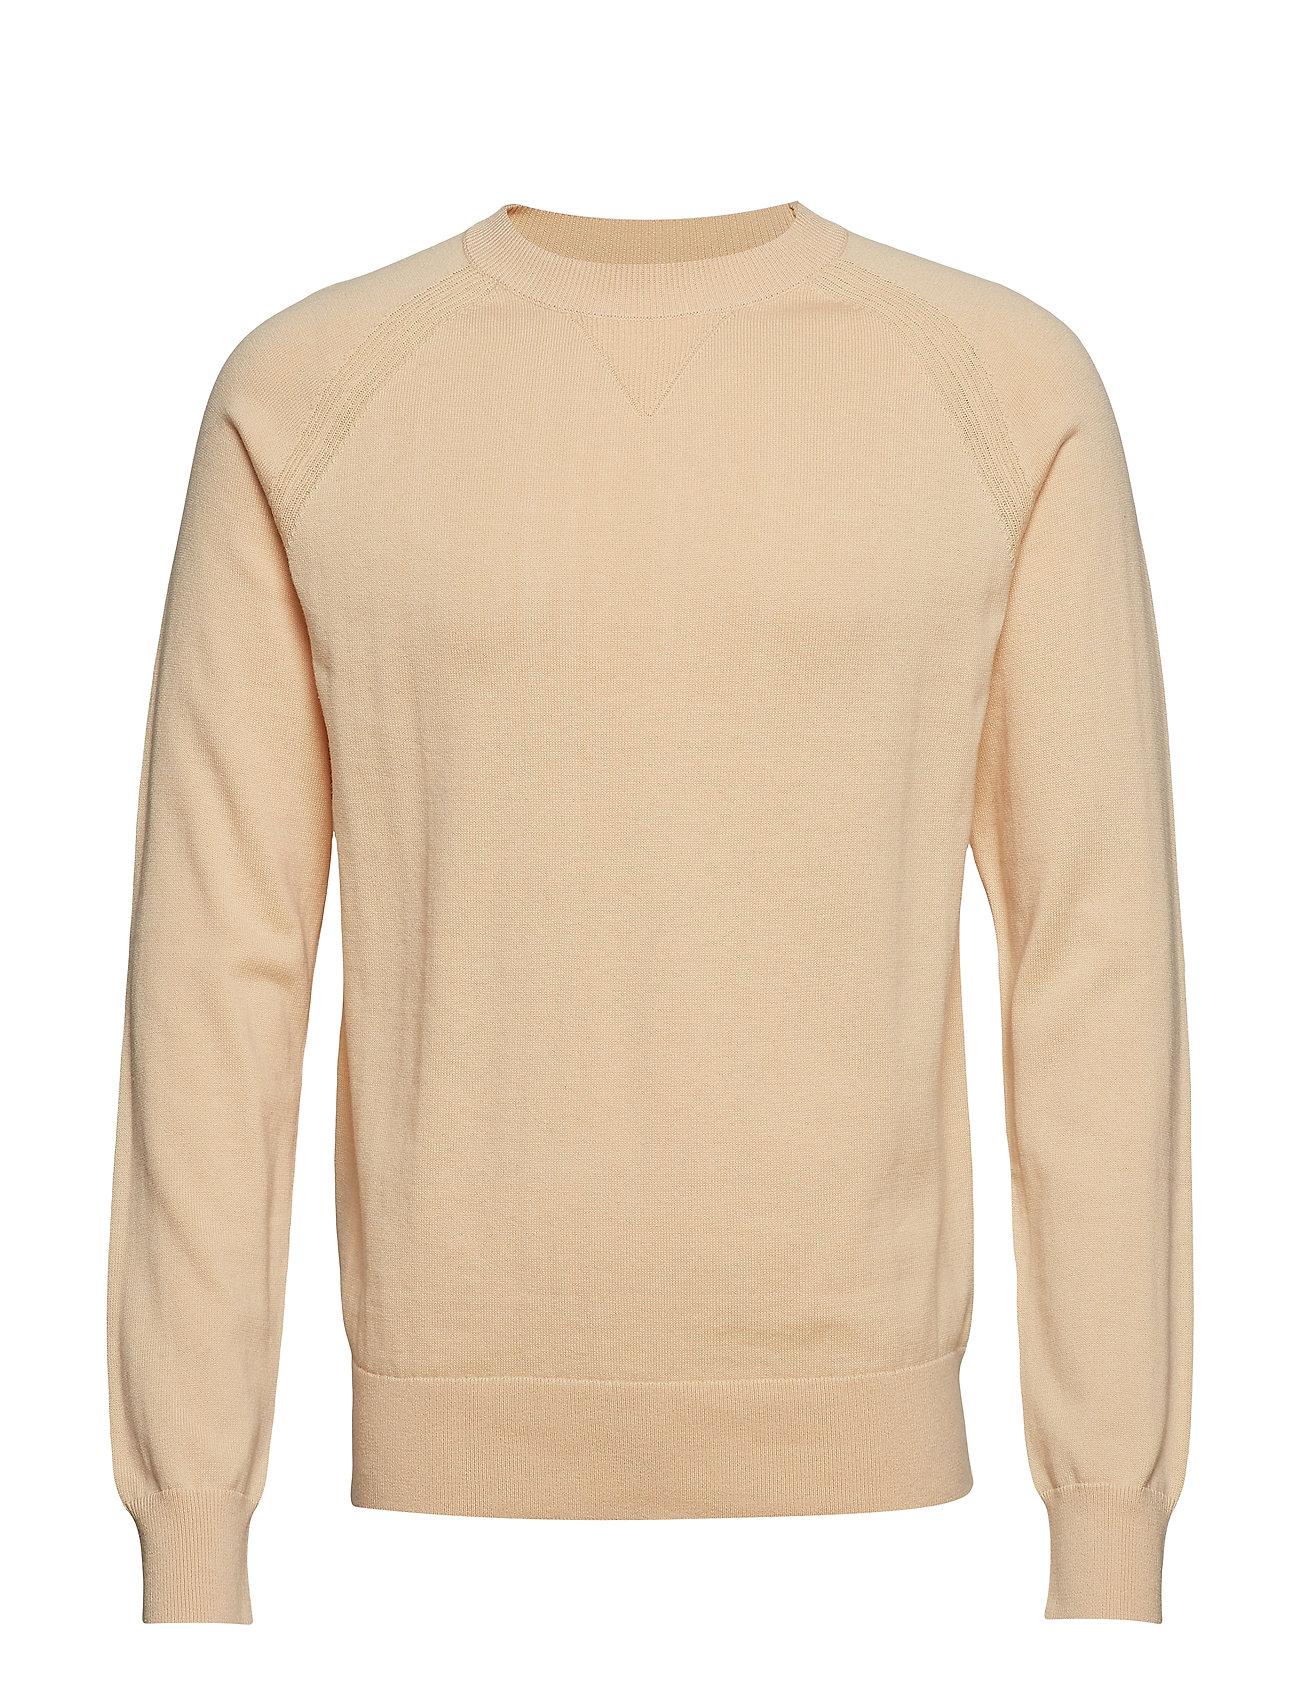 Filippa K M. Cotton Cashmere Knitted Swe - BELLINI